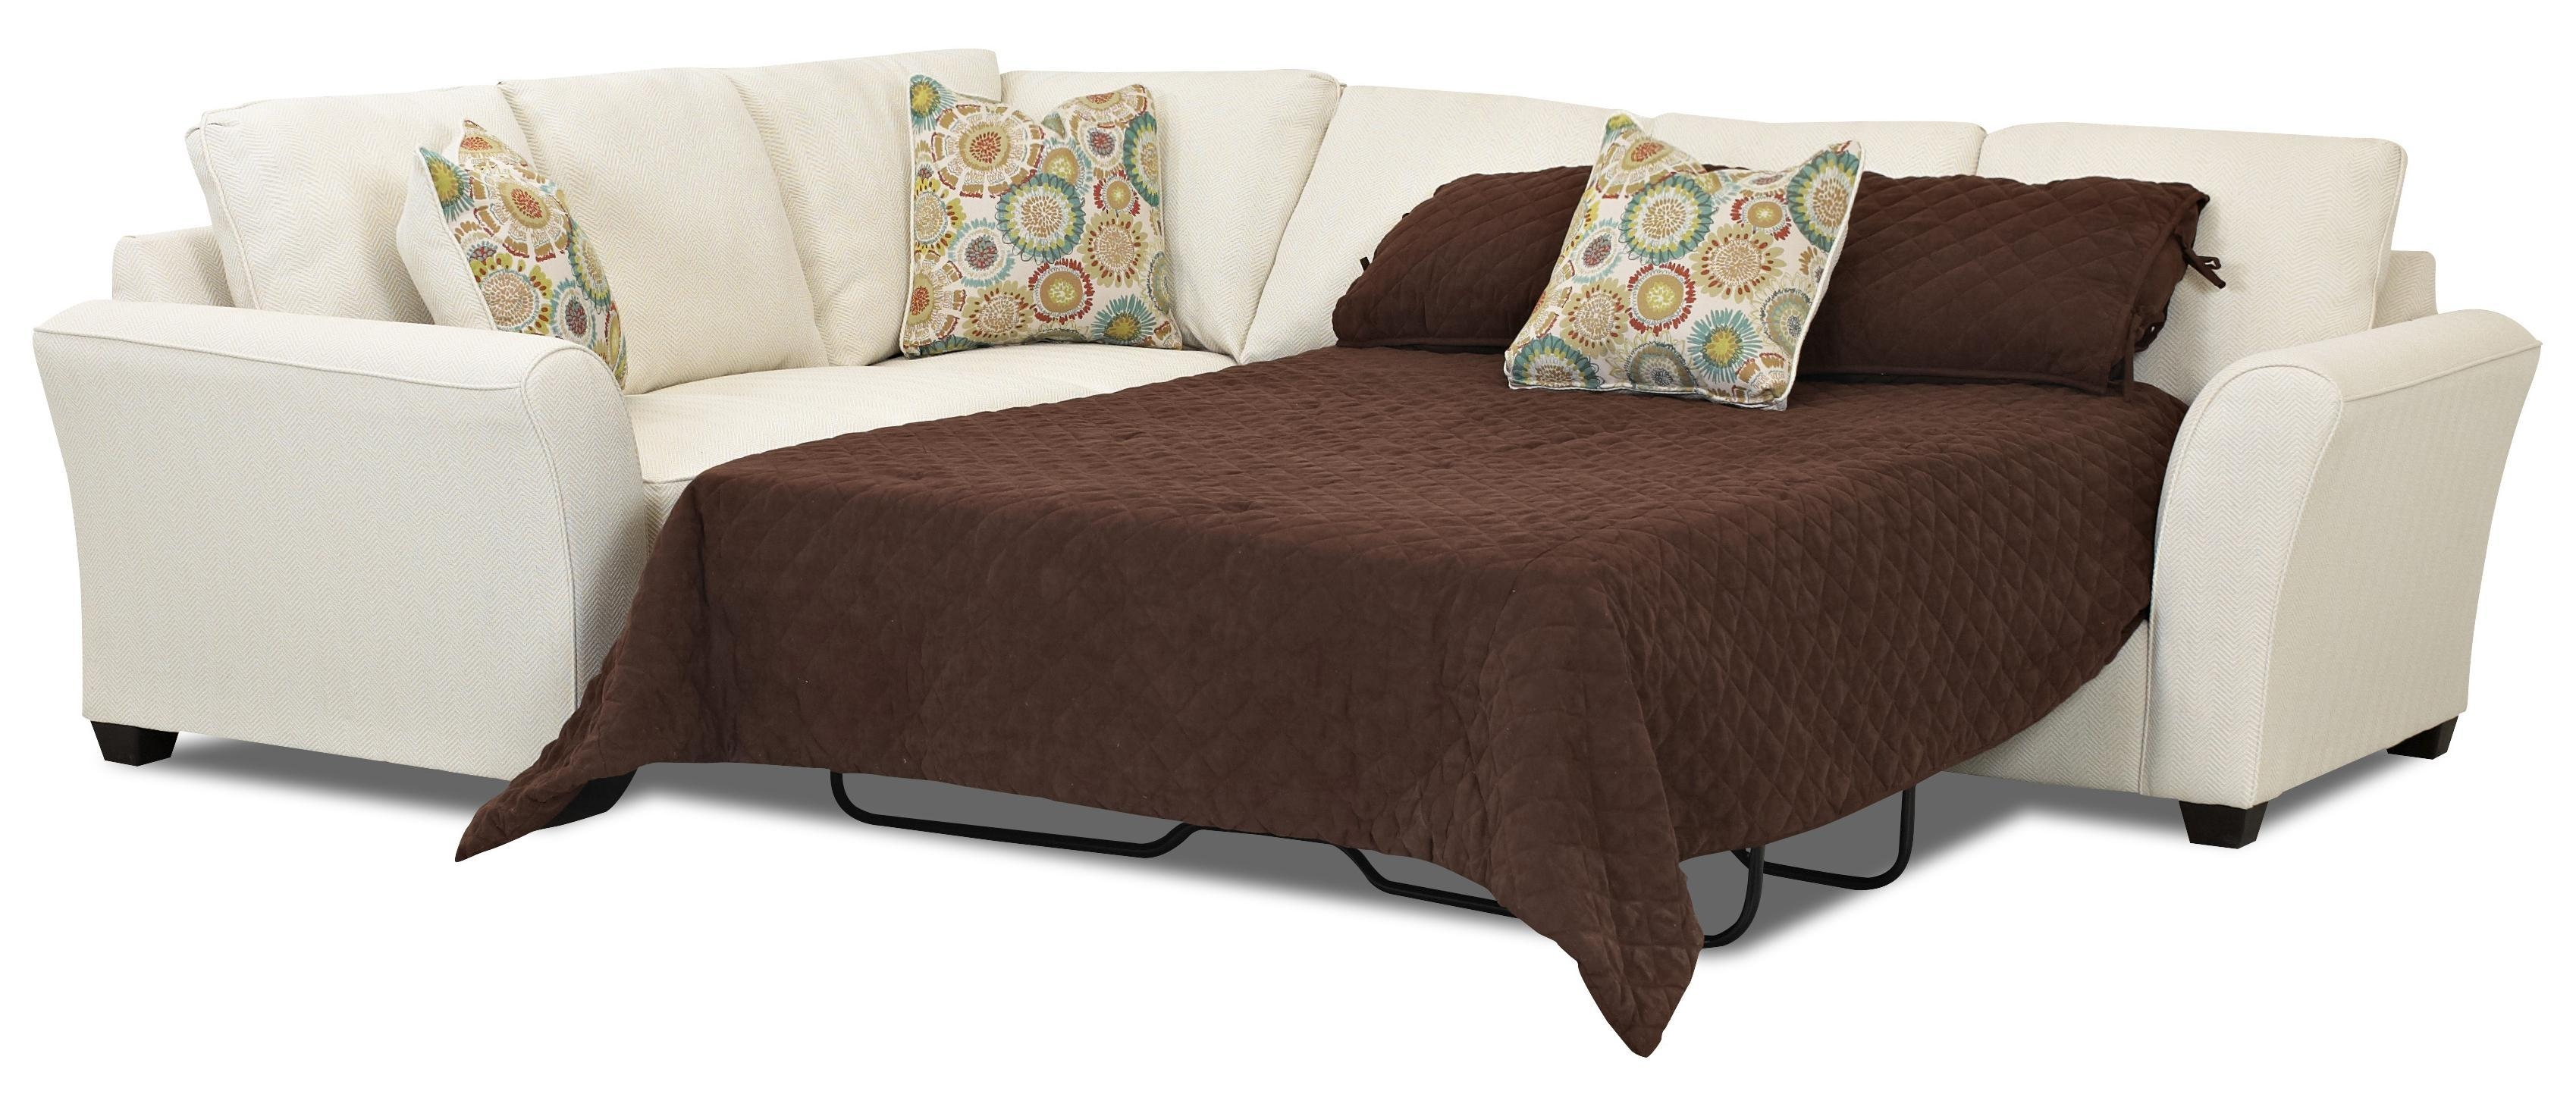 Sofa Small Corner Sleeper | Tamingthesat Within Corner Sleeper Sofas (Image 19 of 20)